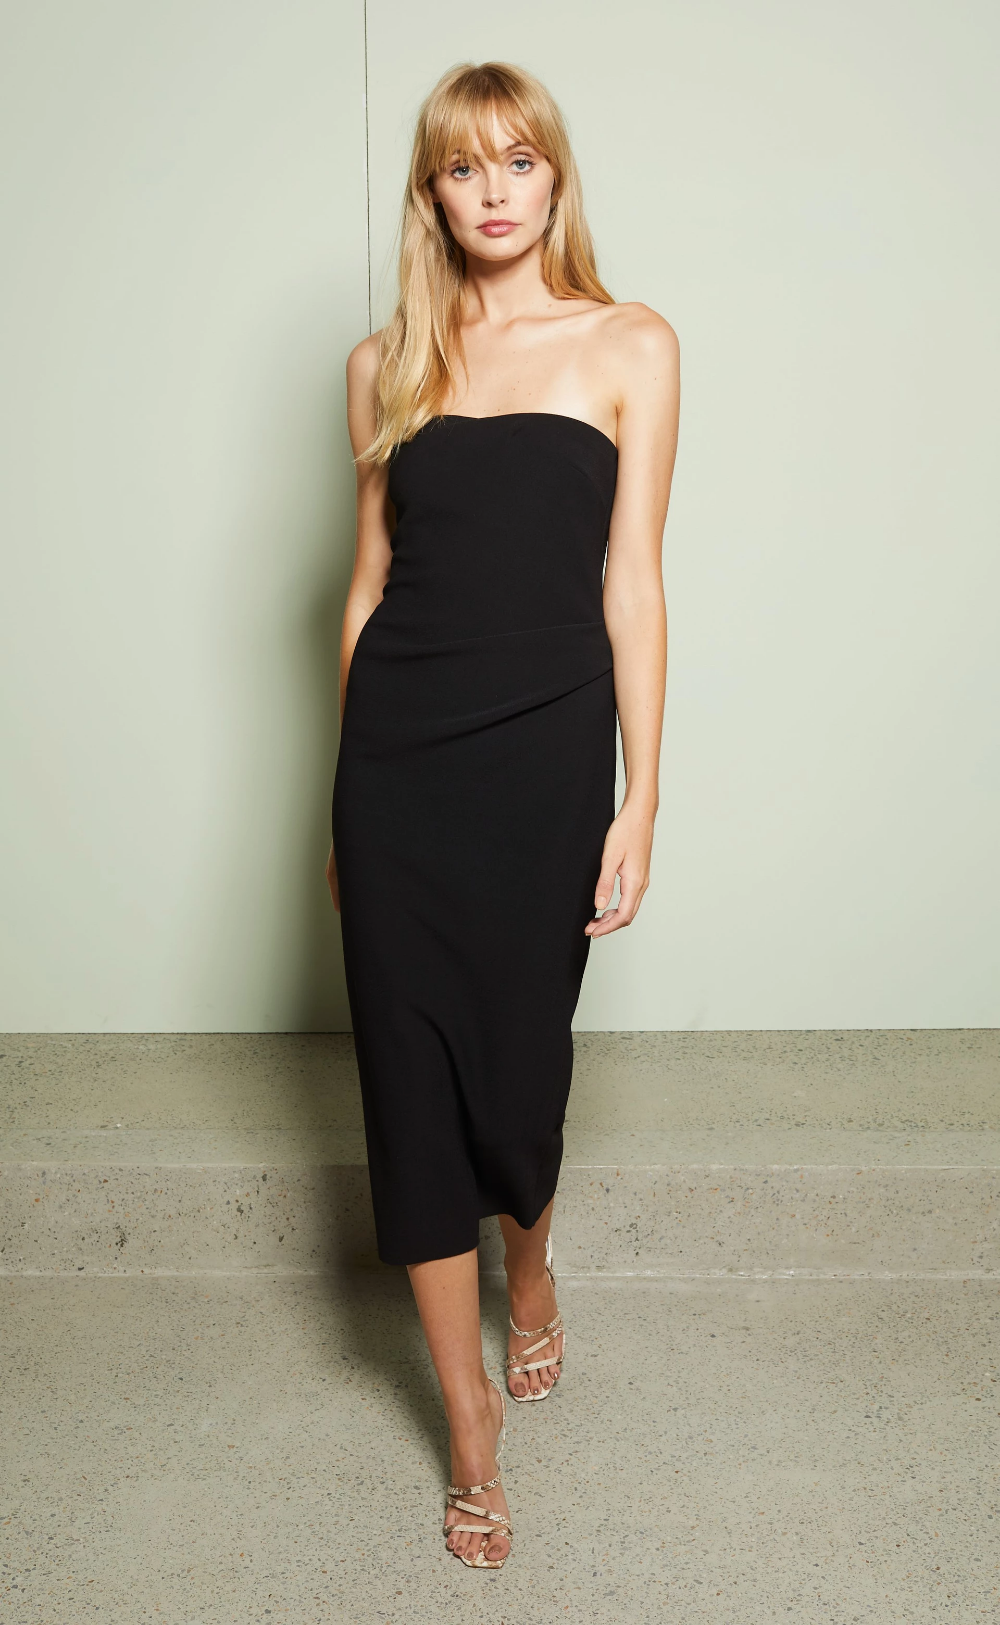 Elke Strapless Midi Dress Black Bec Bridge Black Midi Dress Midi Dress Dresses [ 1625 x 1000 Pixel ]